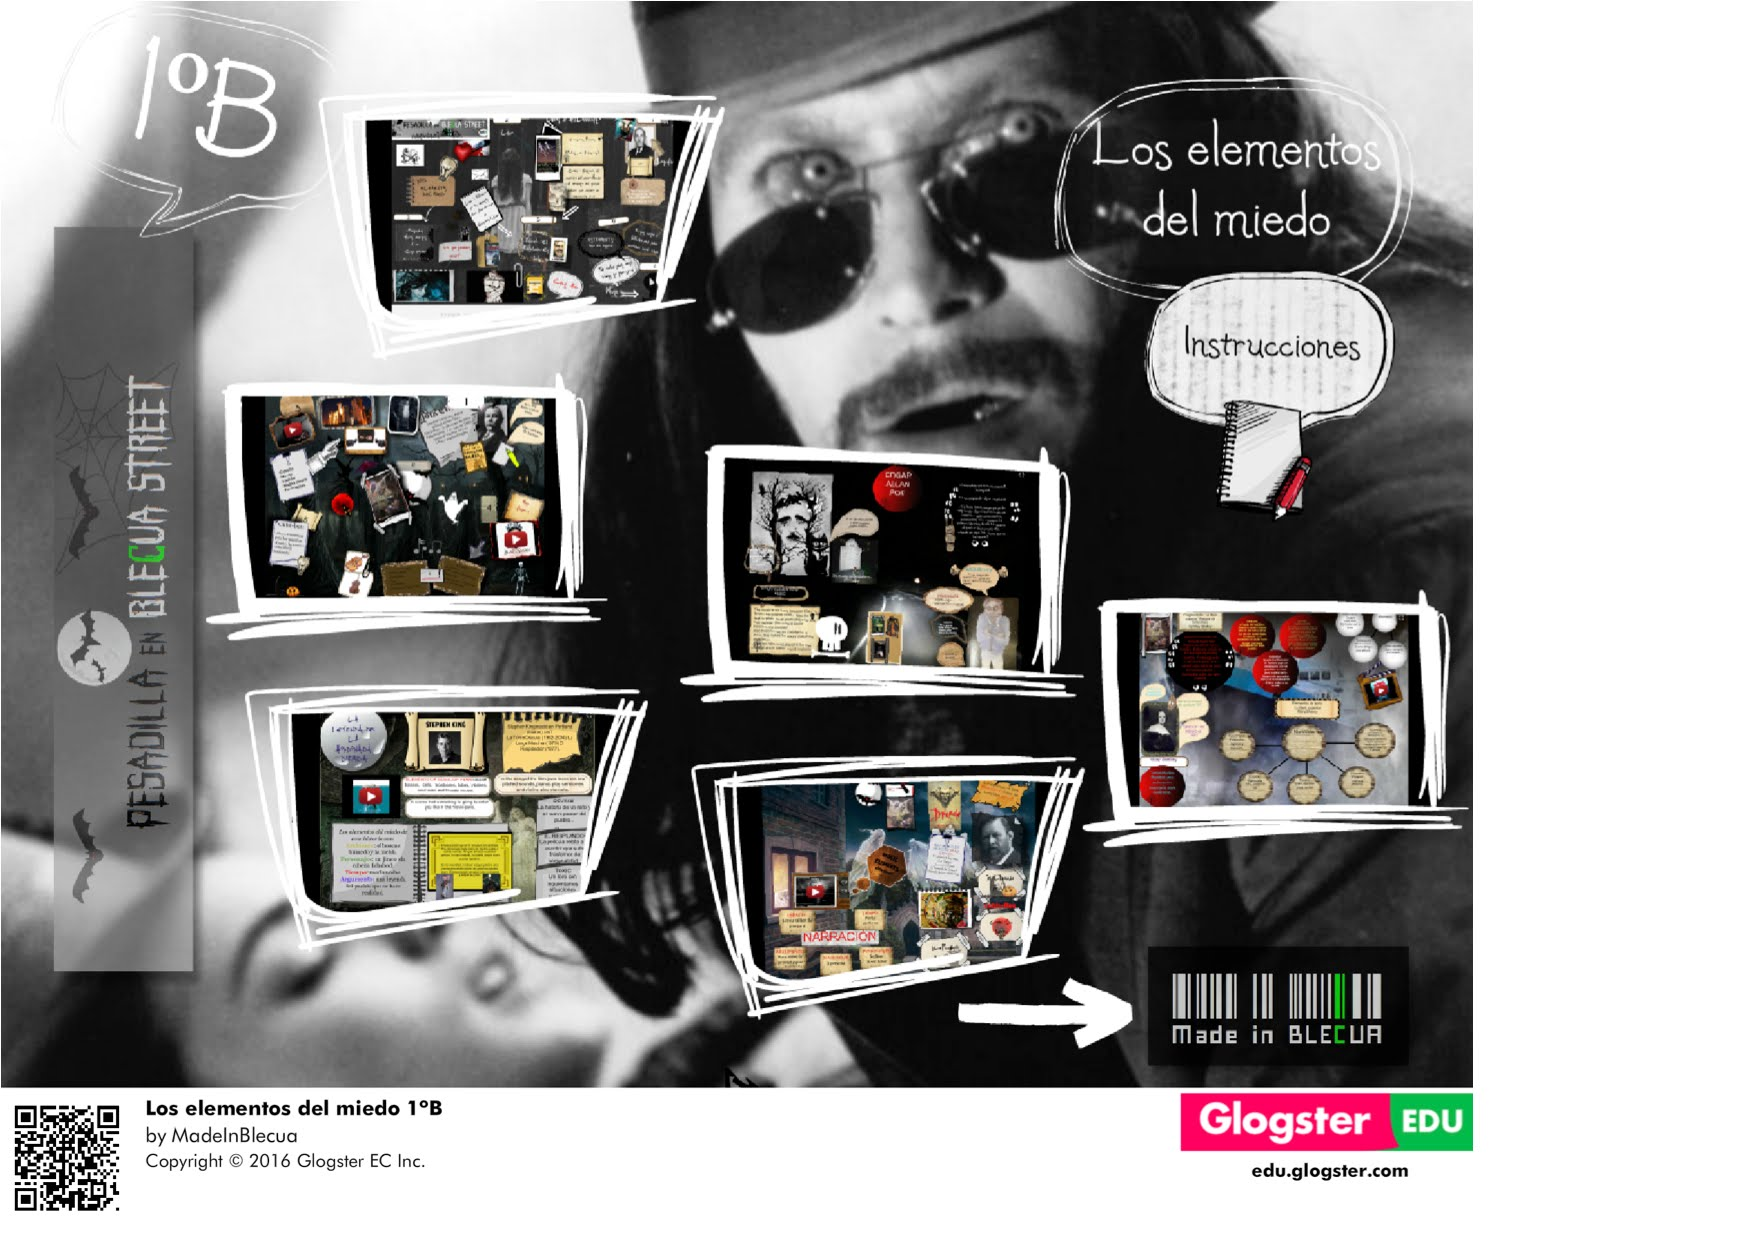 http://madeinblecua.edu.glogster.com/los-elementos-del-miedo-1a-58403751eb398